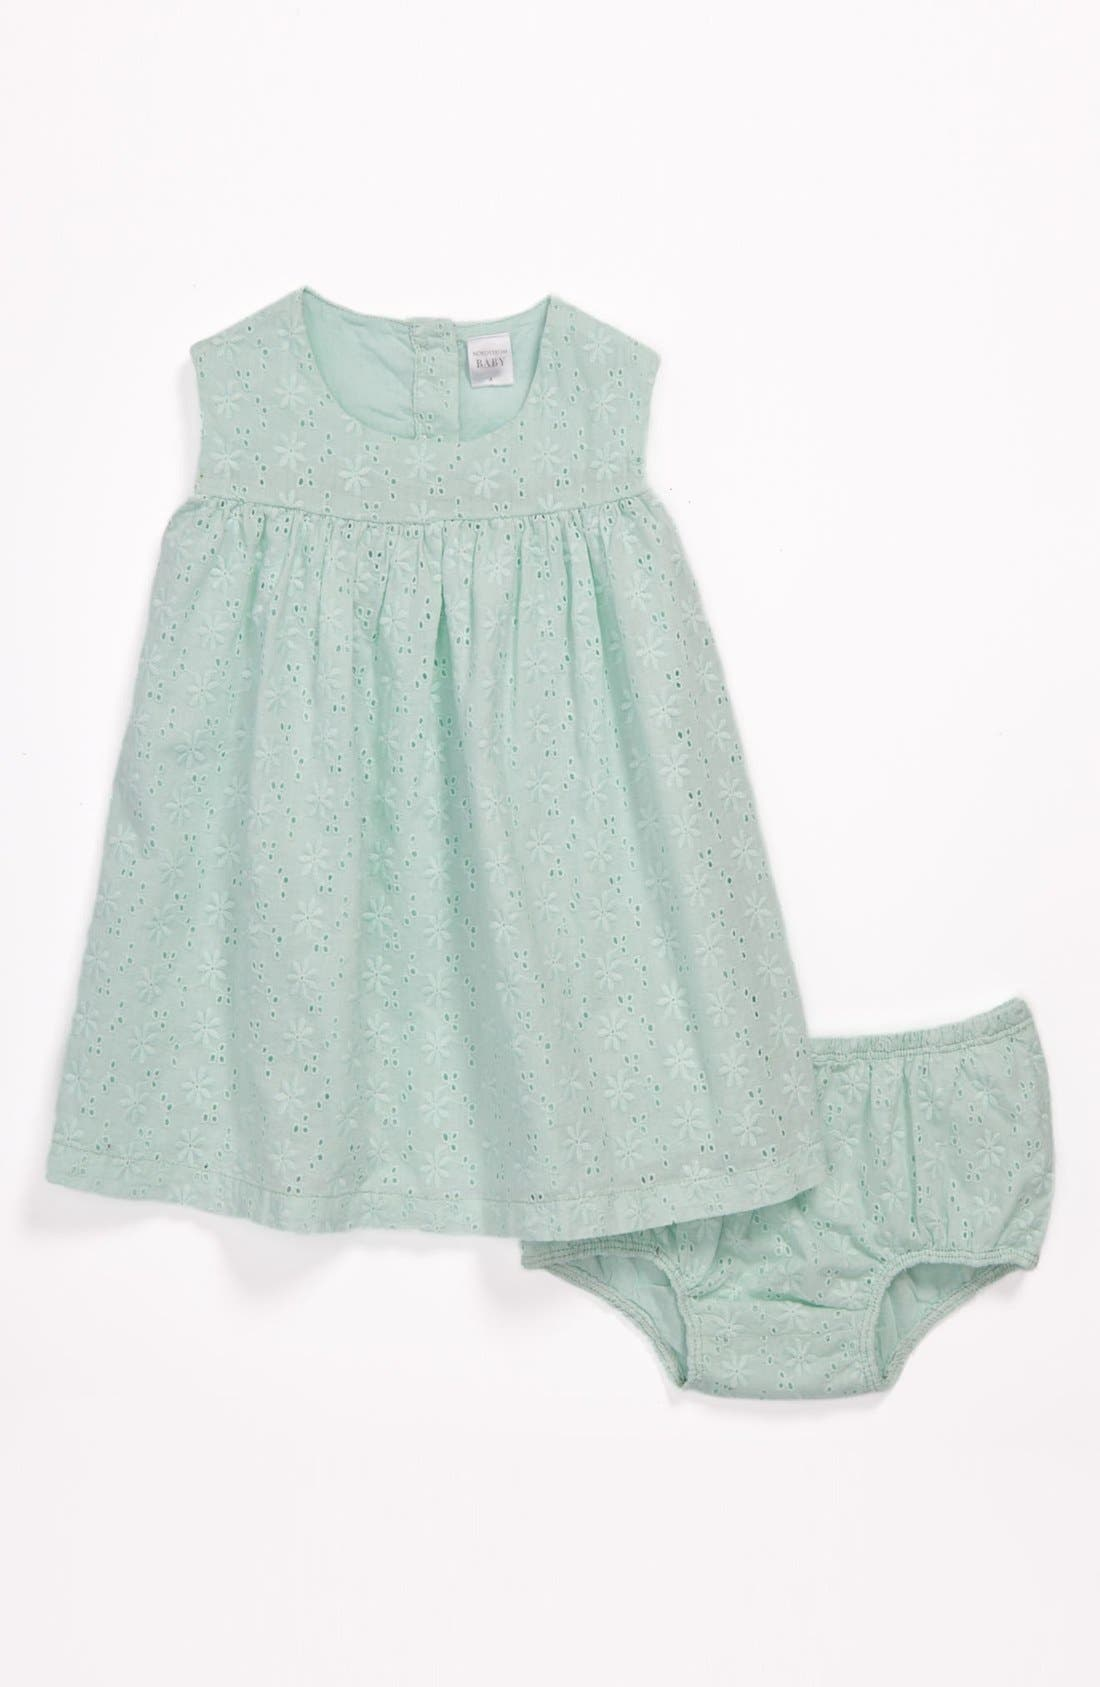 Main Image - Nordstrom Baby Eyelet Dress & Bloomers (Baby Girls)